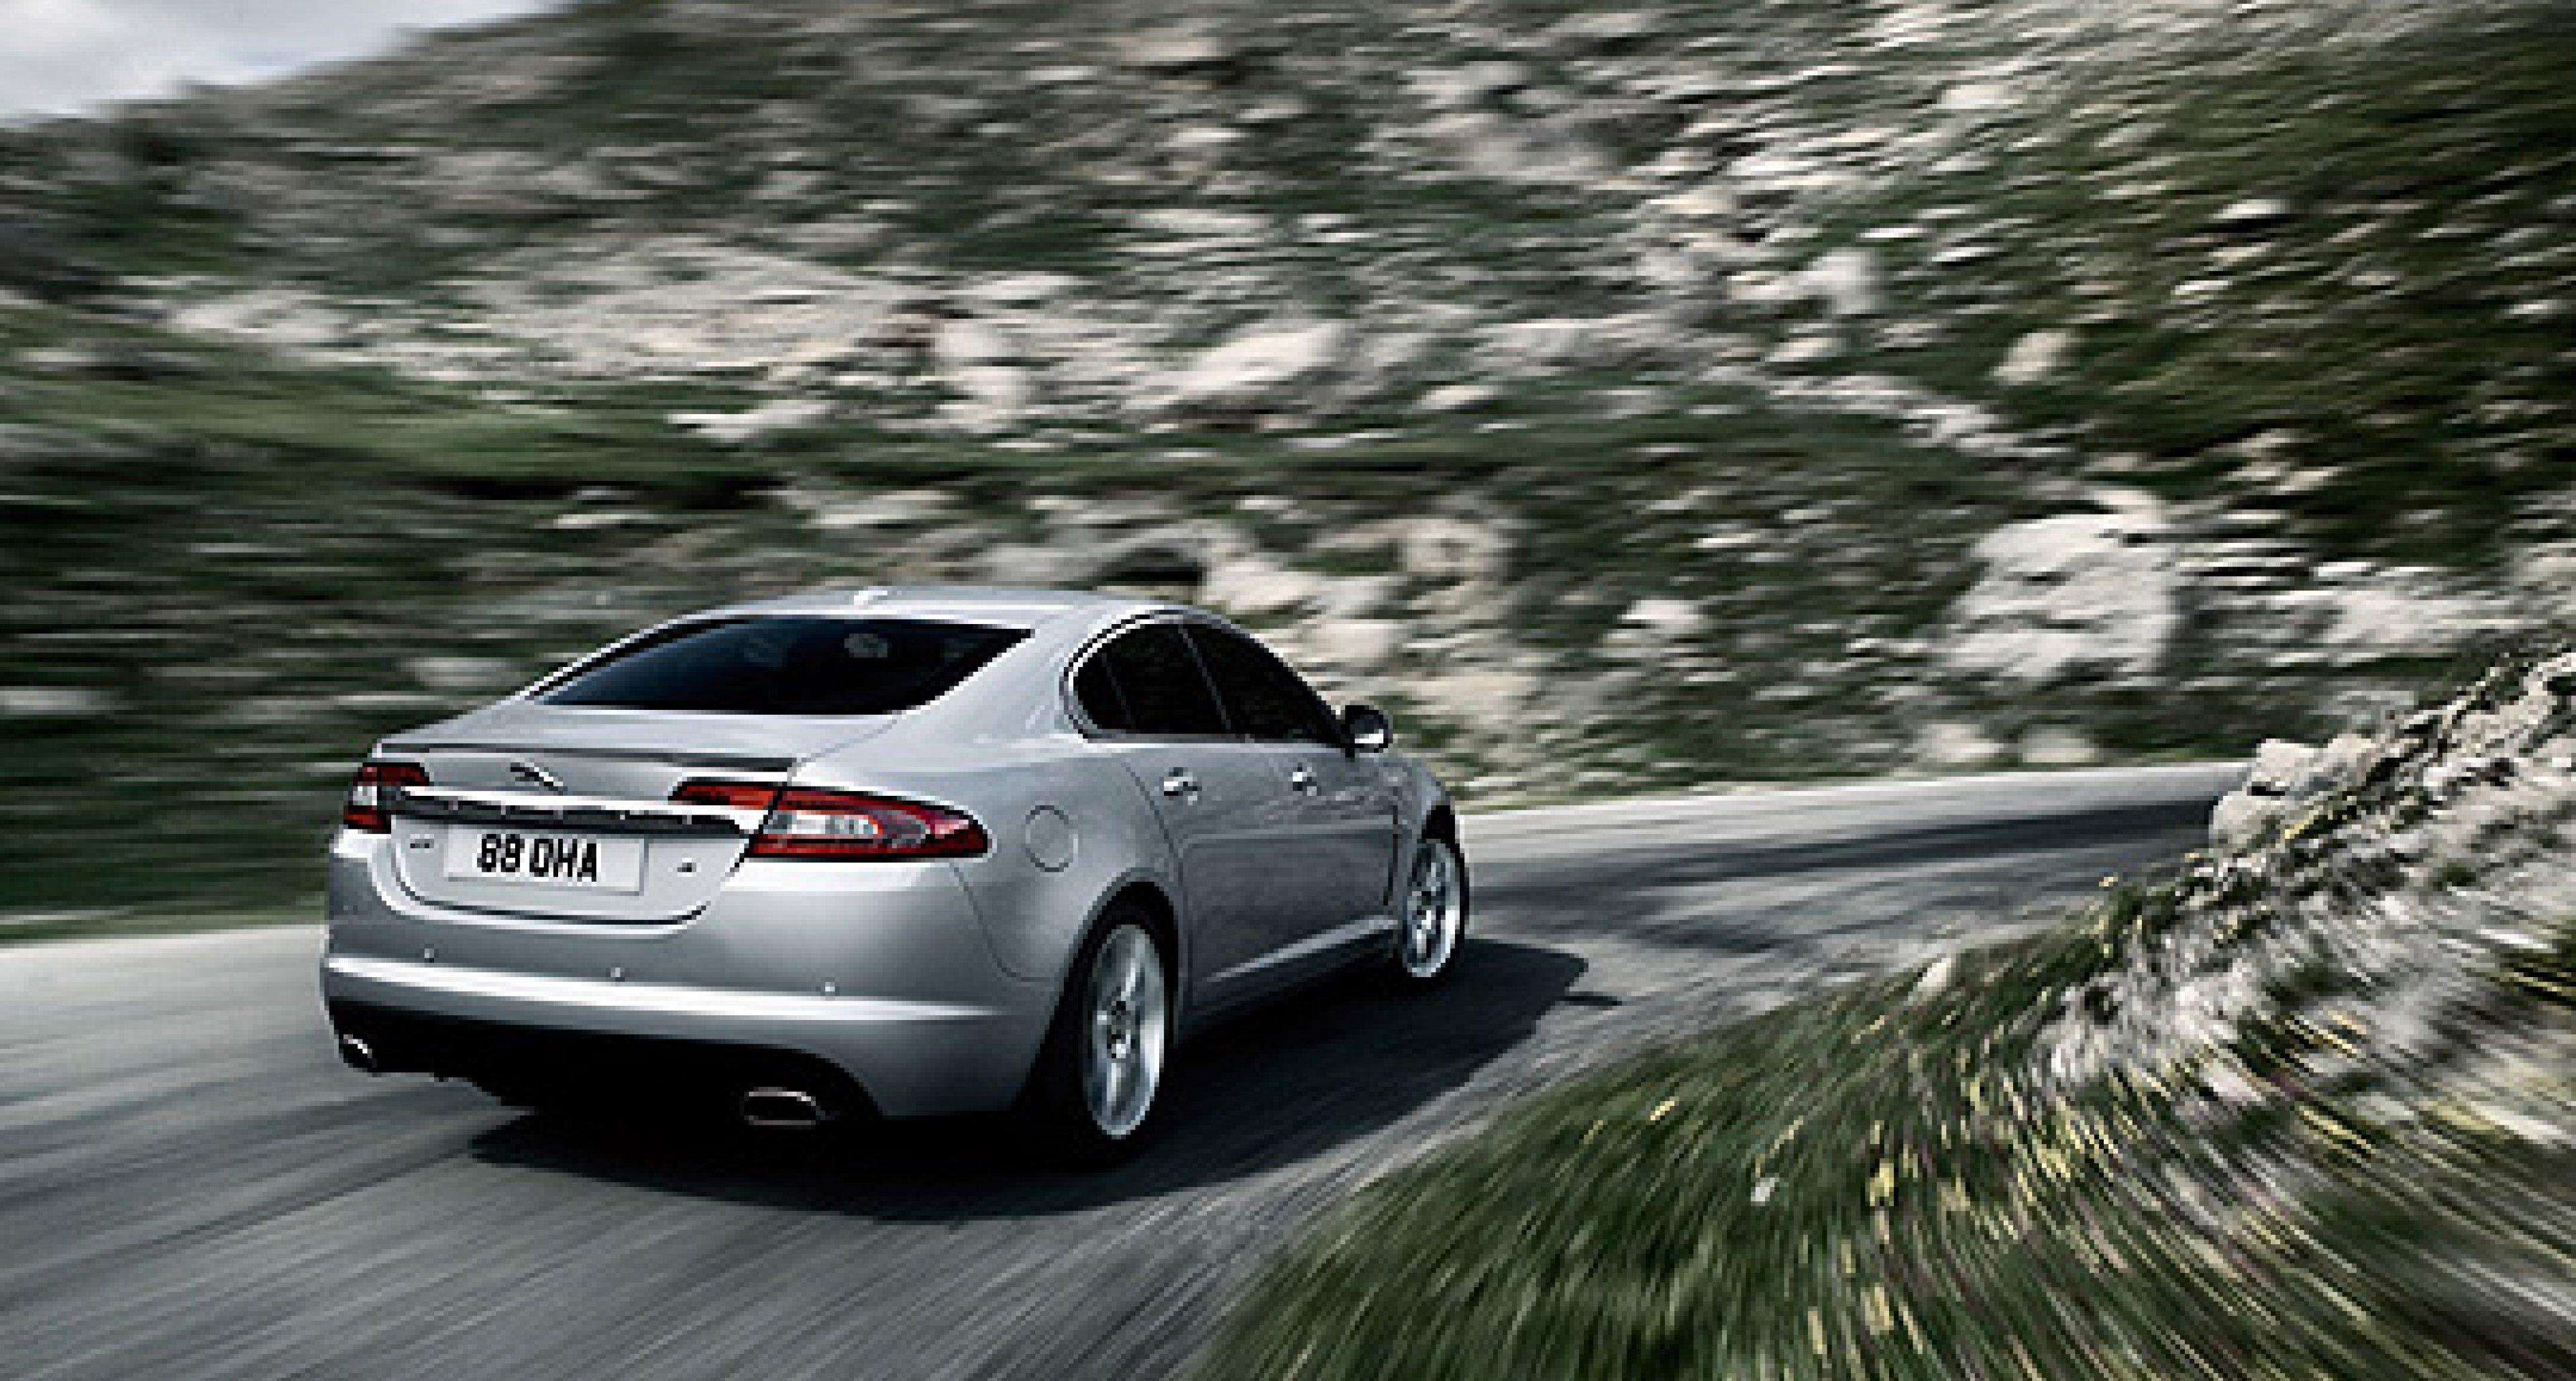 Jaguar XF 3.0 V6 Diesel: Starke Diesel-Offensive